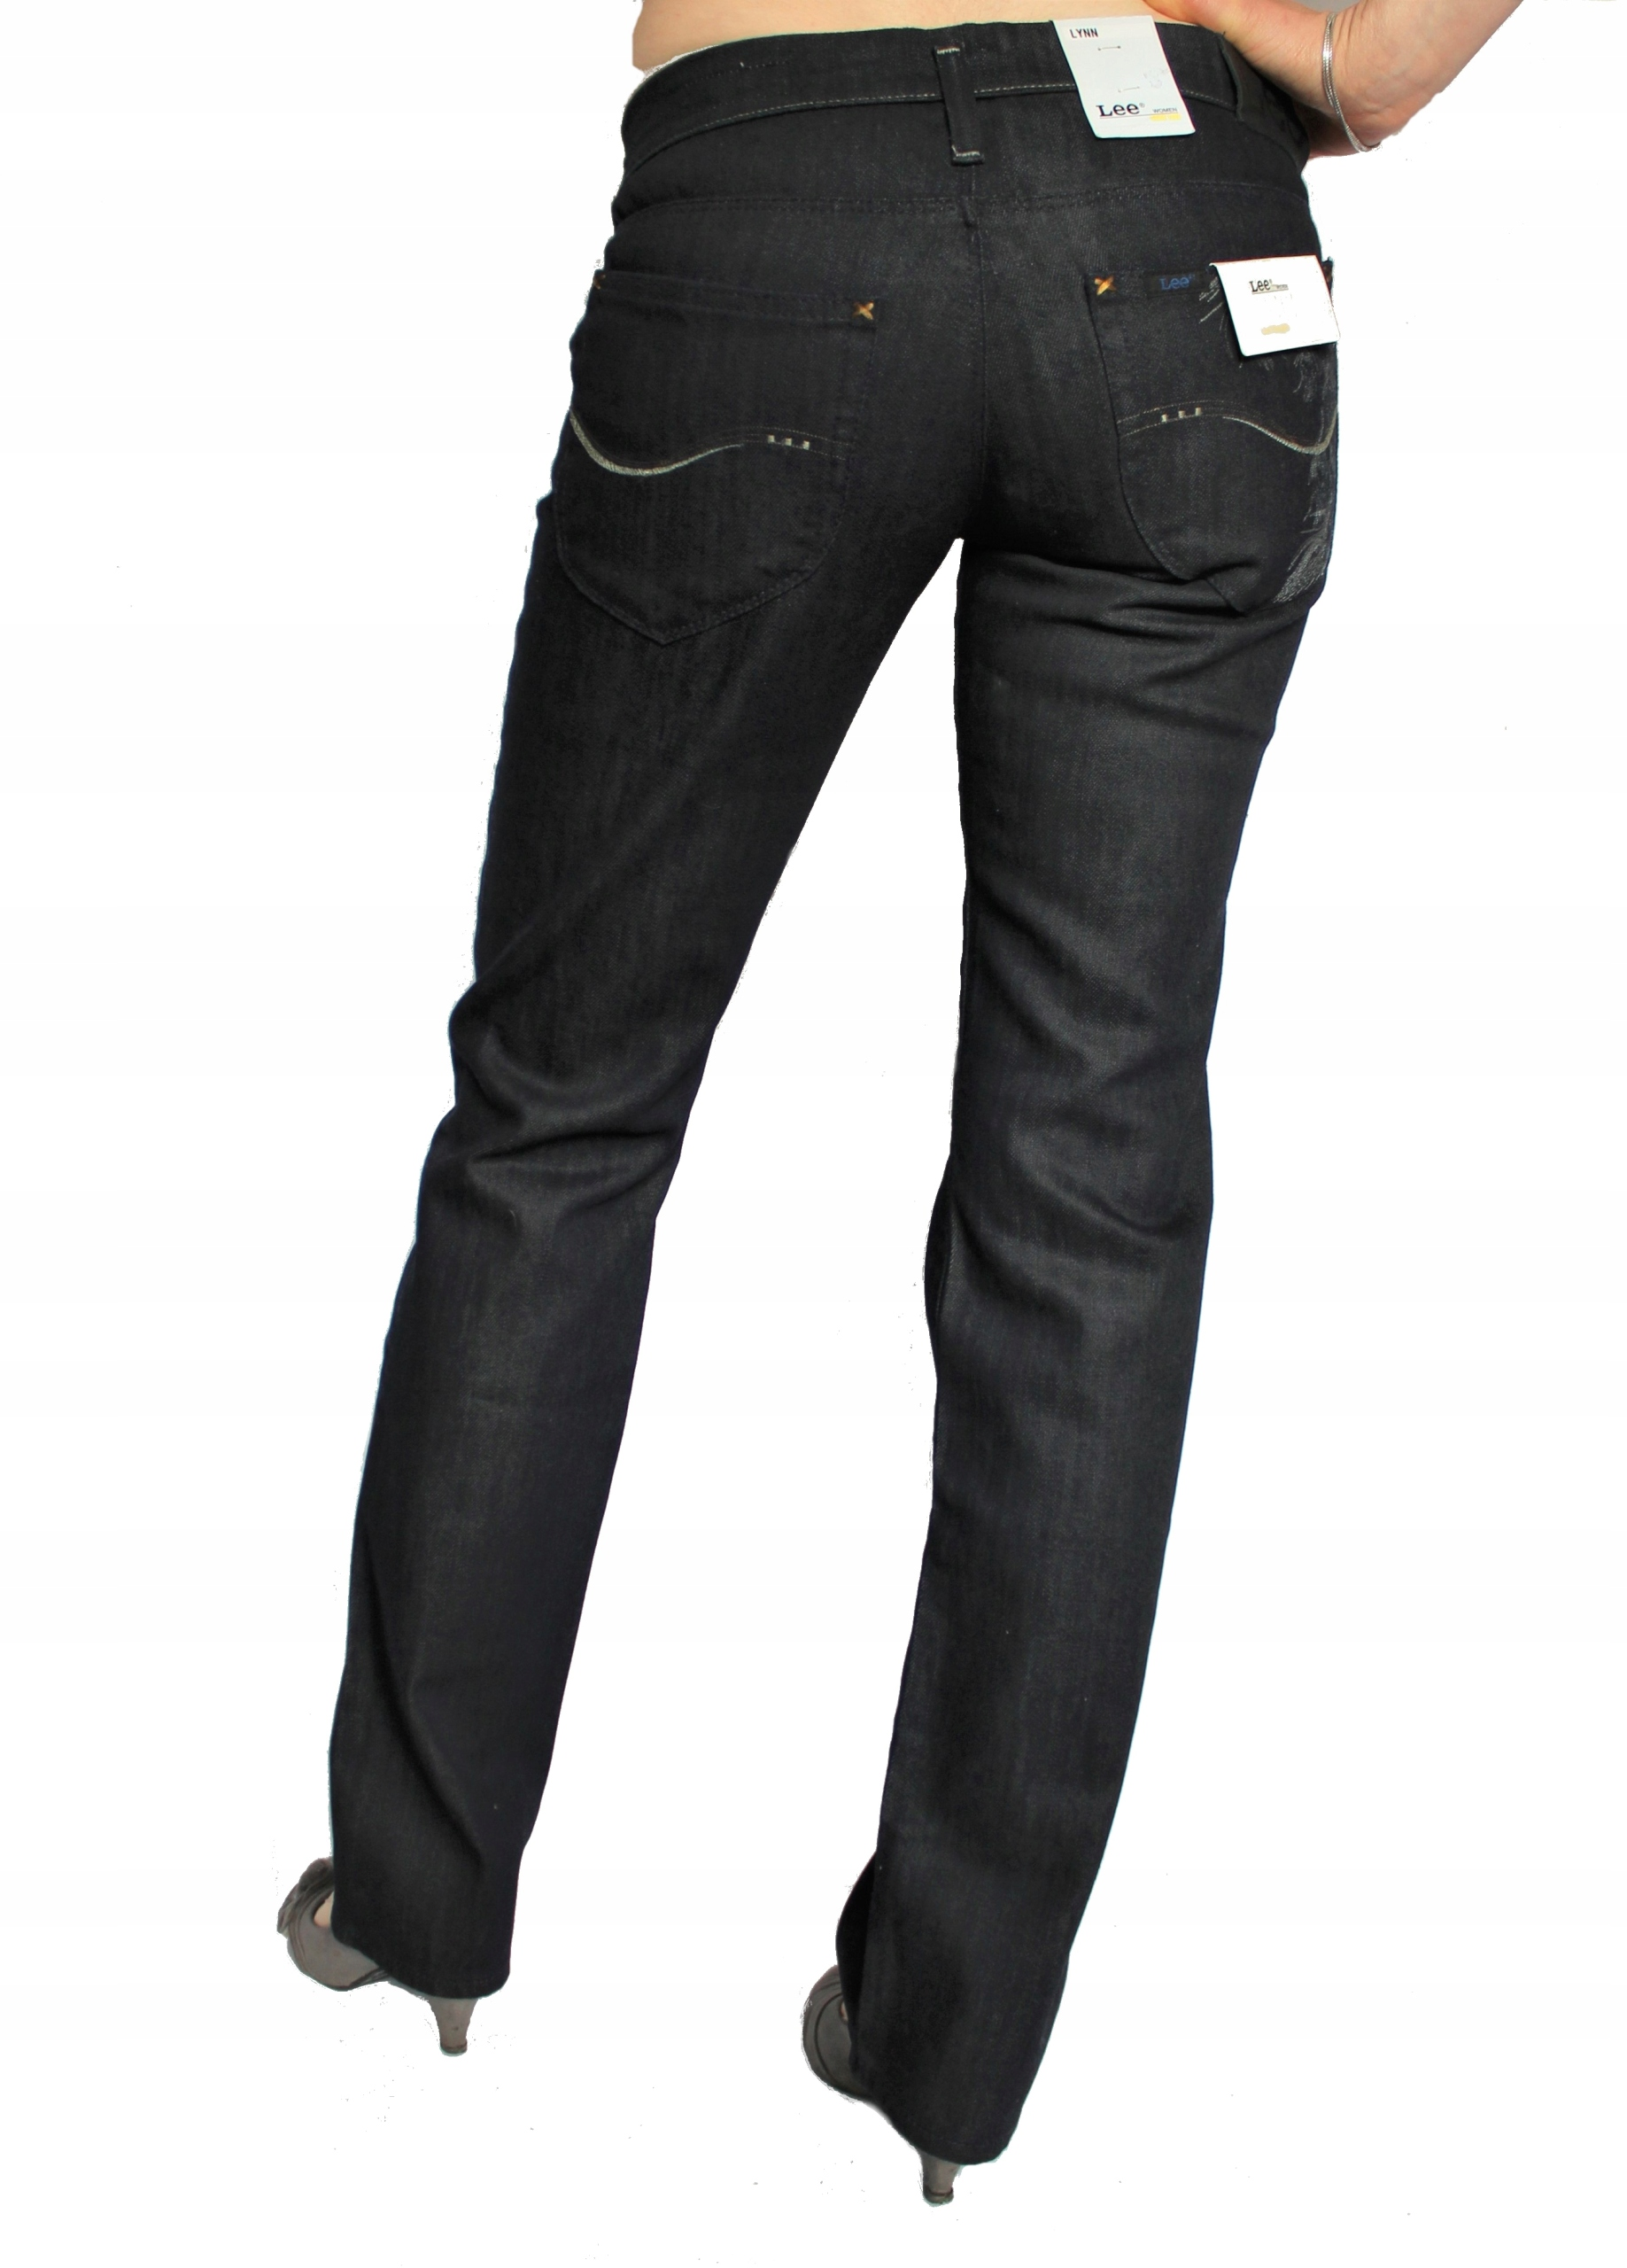 Lee Lynn Straight spodnie biodrówki W25 L33 Xs / S